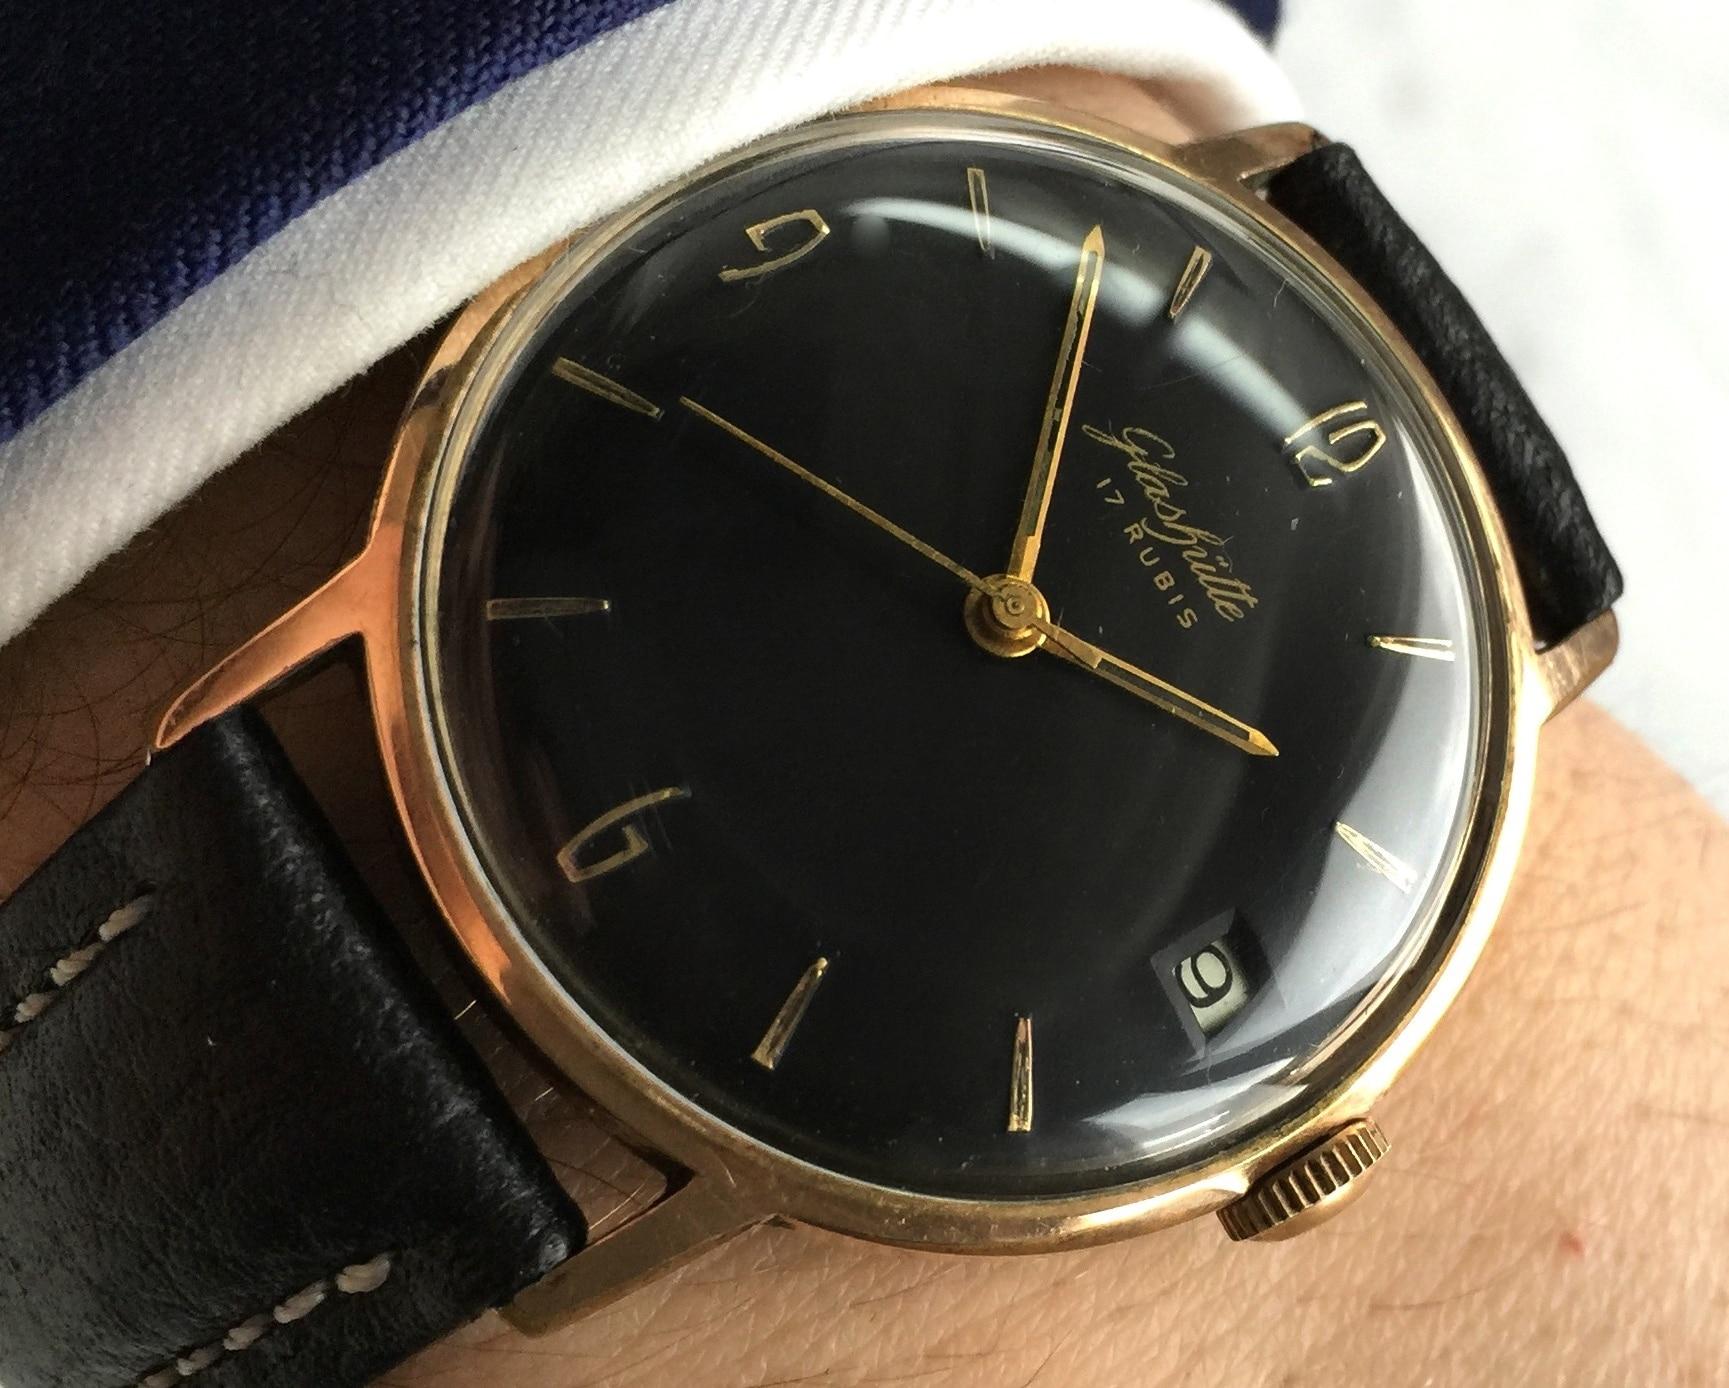 Vintage Glashütte Spezimatic black dial